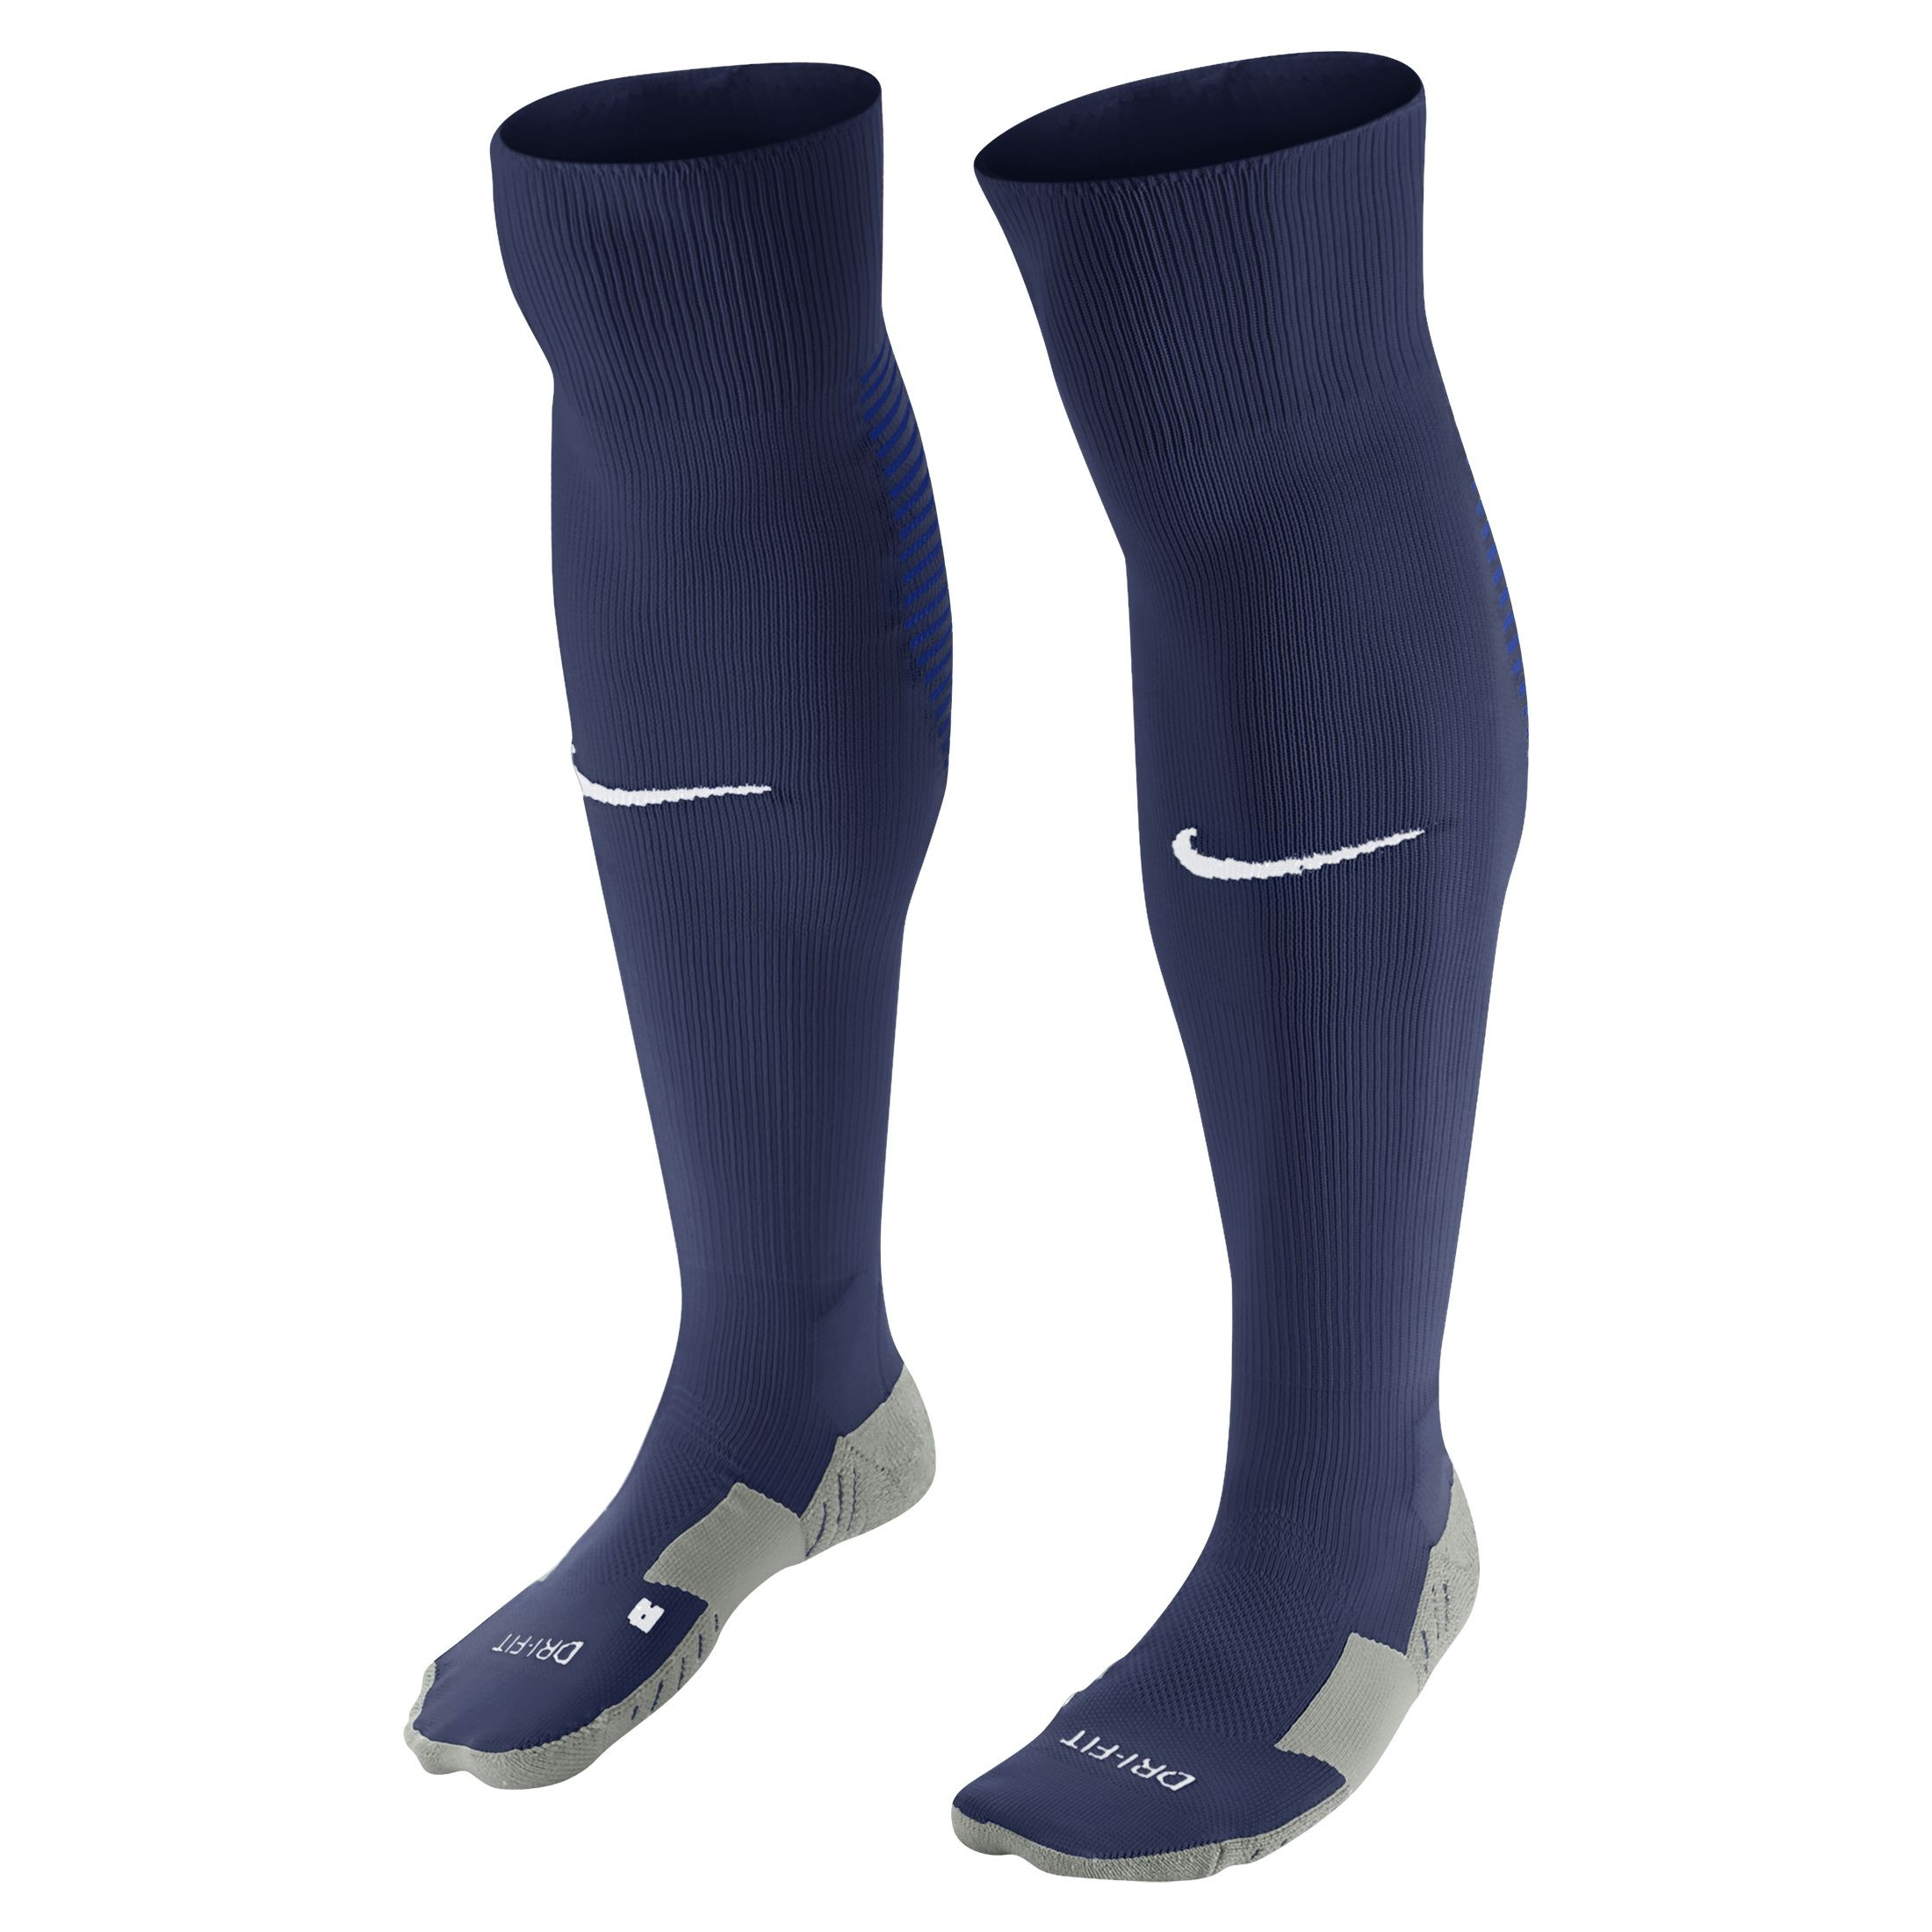 2f89107e706 chaussette foot nike bleu marine